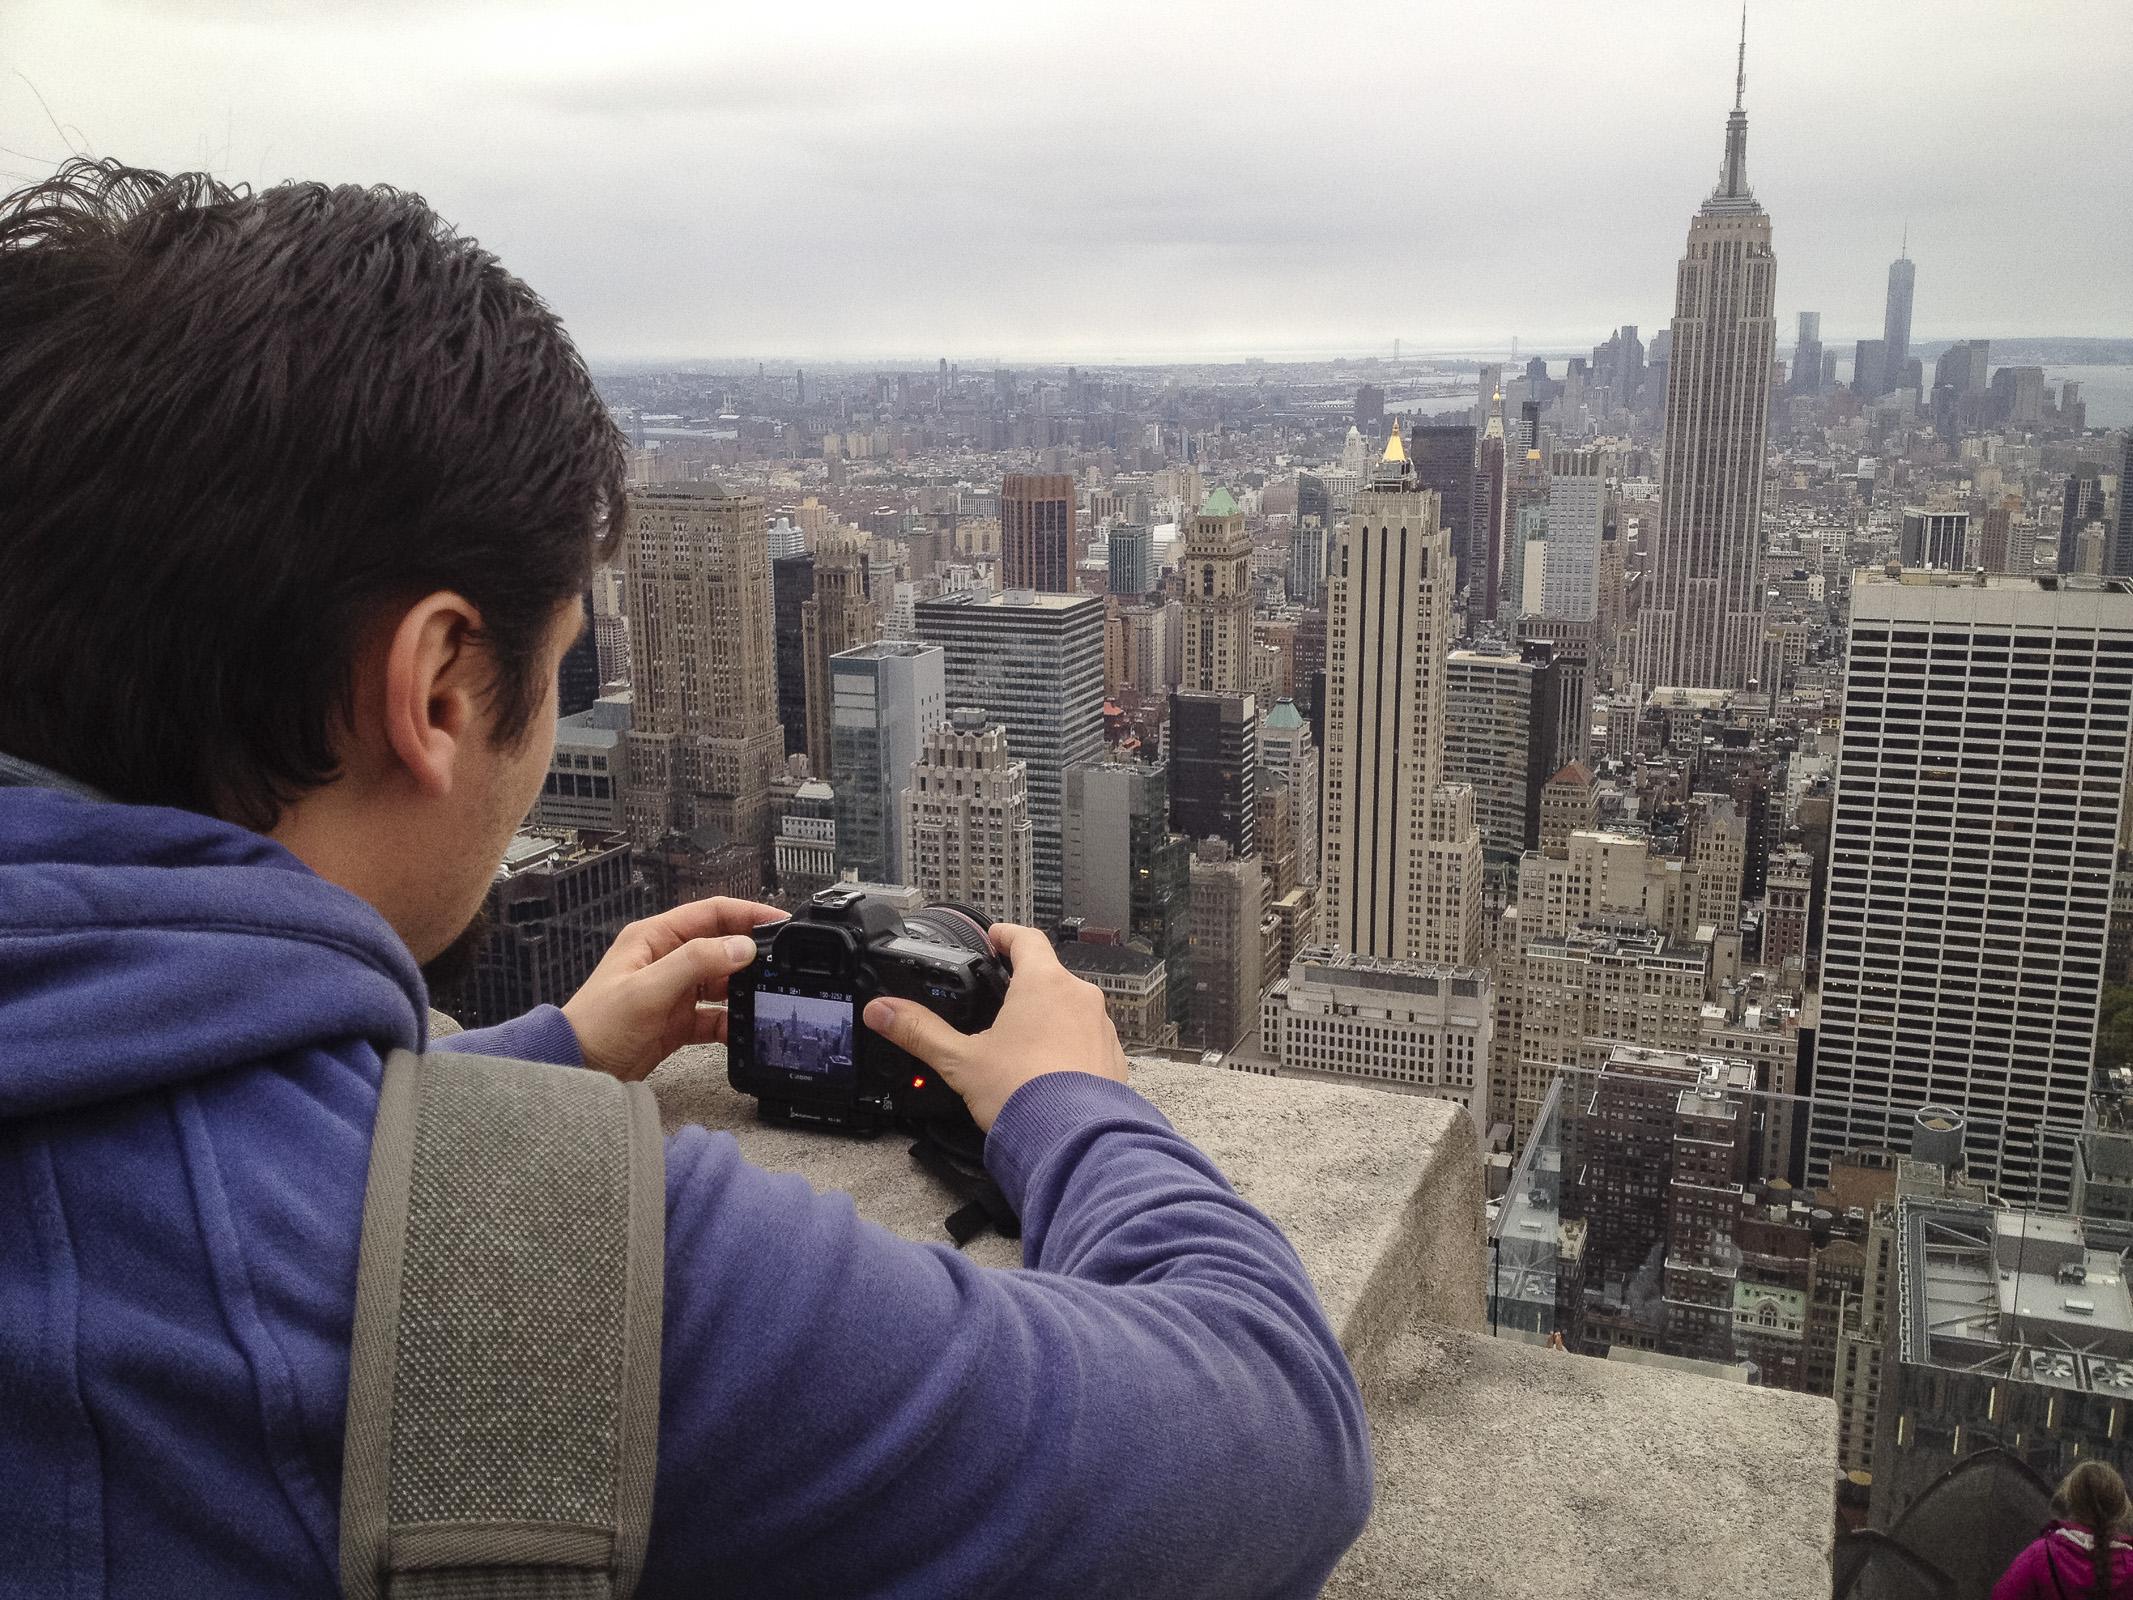 NYC2014-iphone-003.jpg